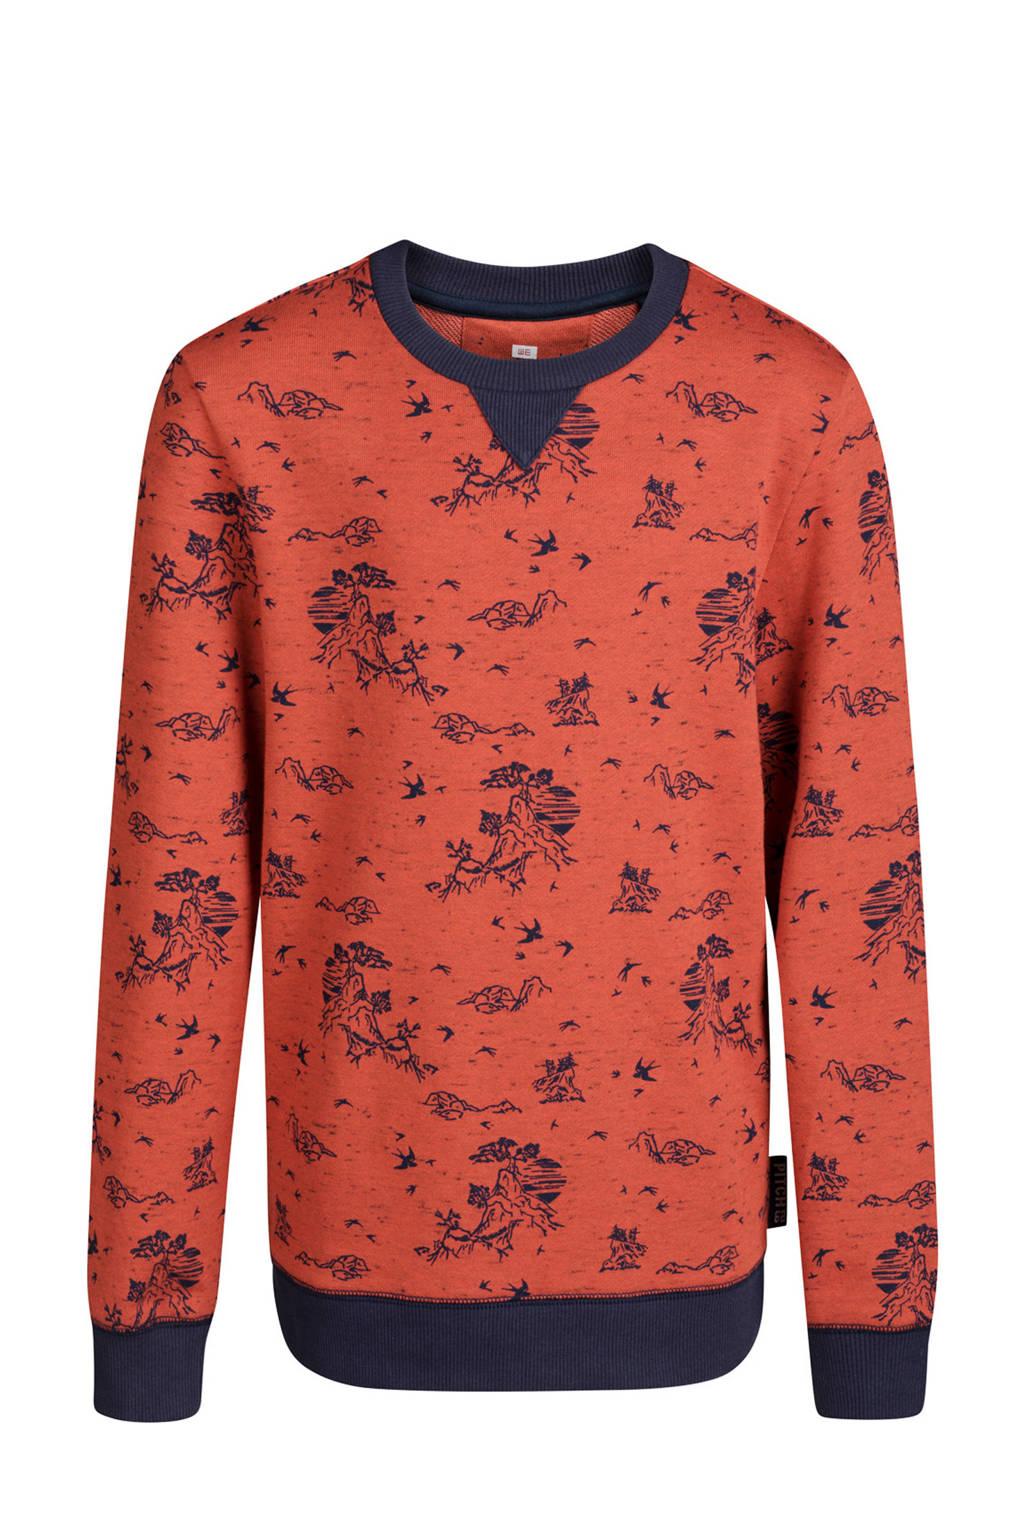 WE Fashion sweater met bergenprint oranje, Oranje/blauw